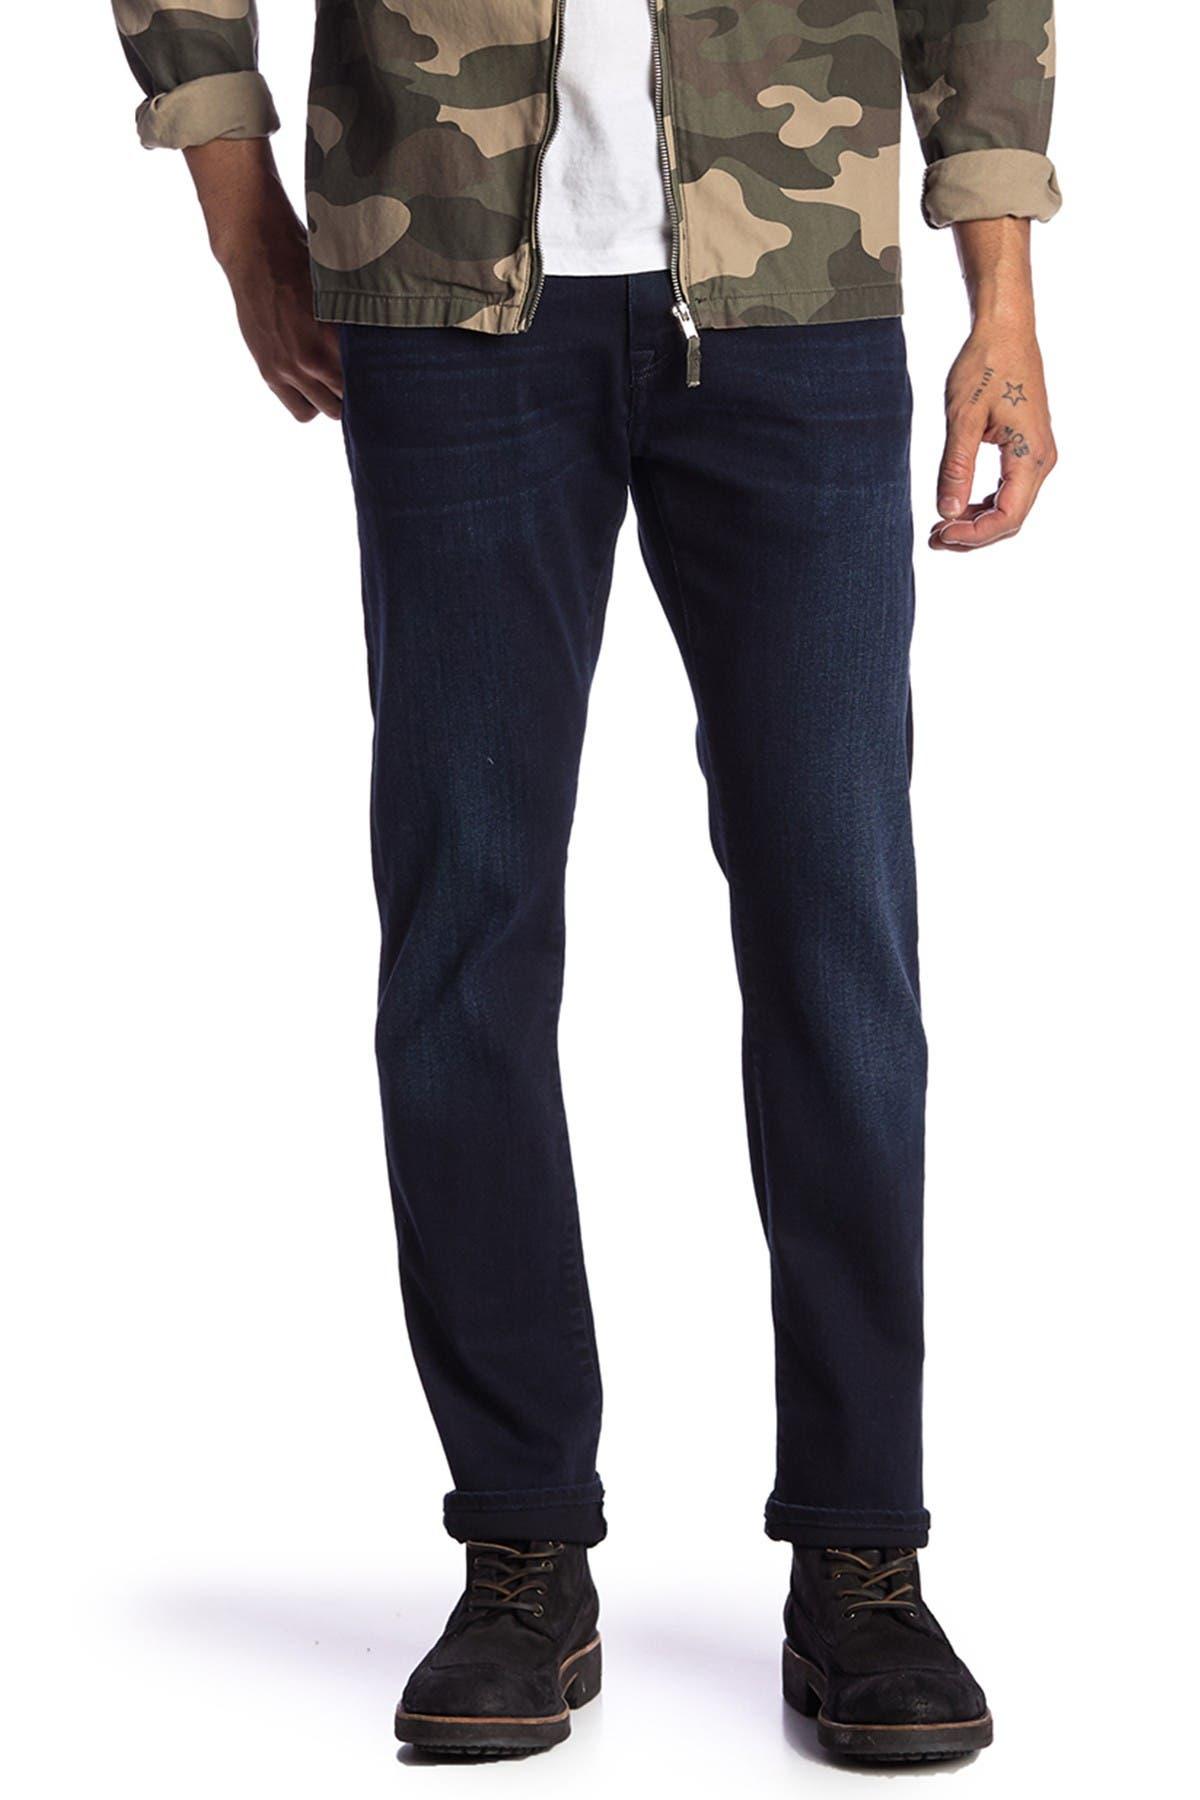 "Image of Mavi Jake Ink Foggy Mountain Slim Fit Jeans - 30-34"" Inseam"